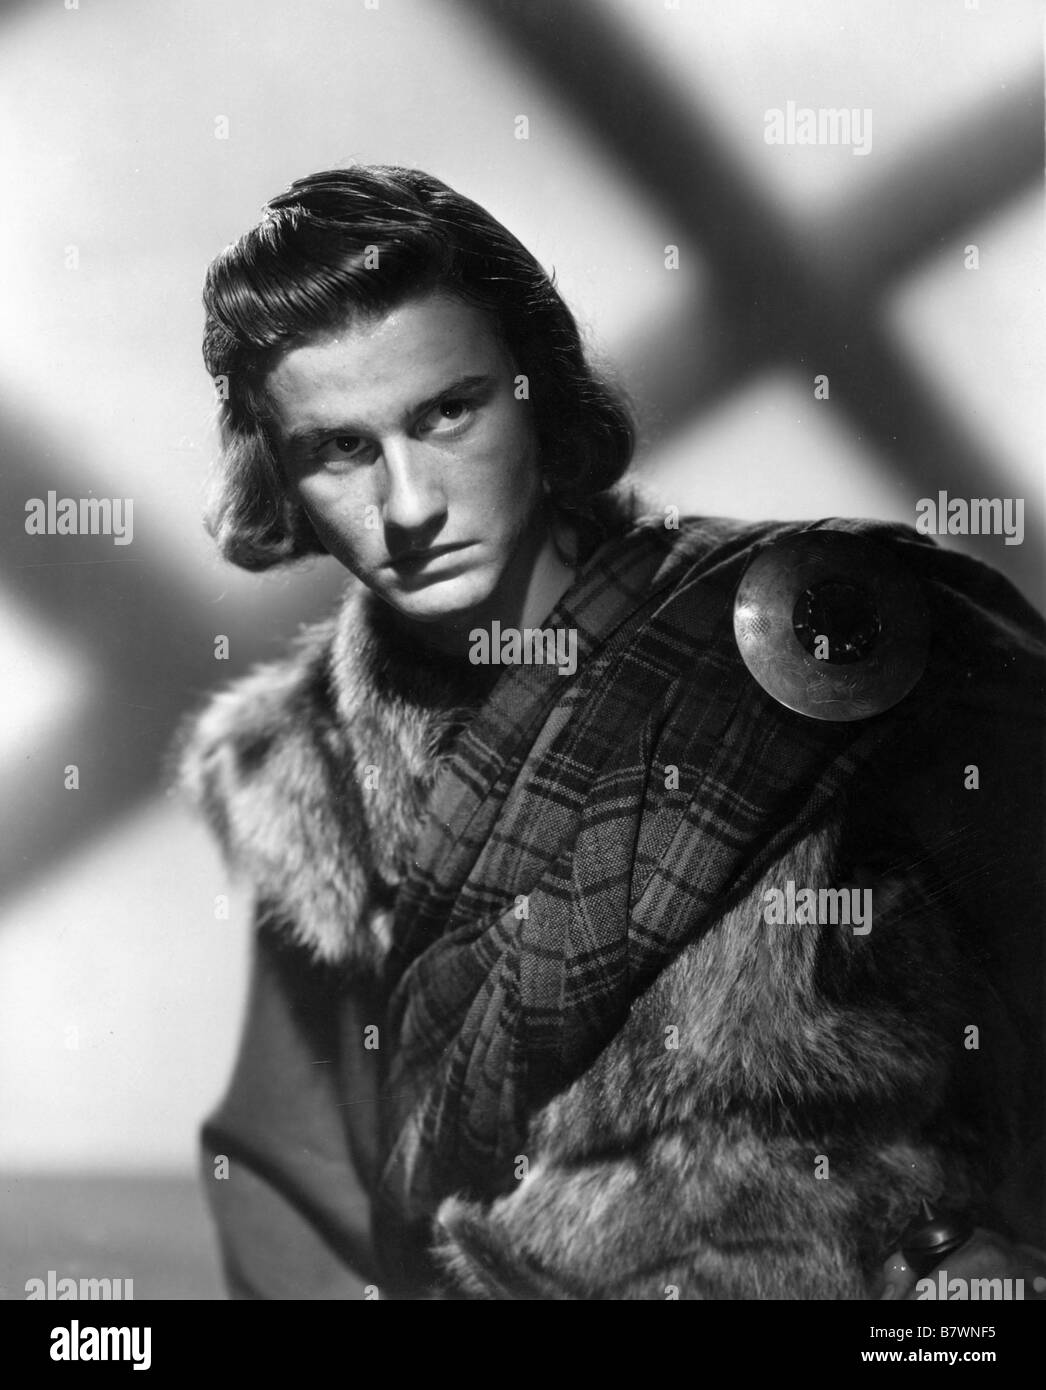 macbeth-year-1948-director-orson-welles-